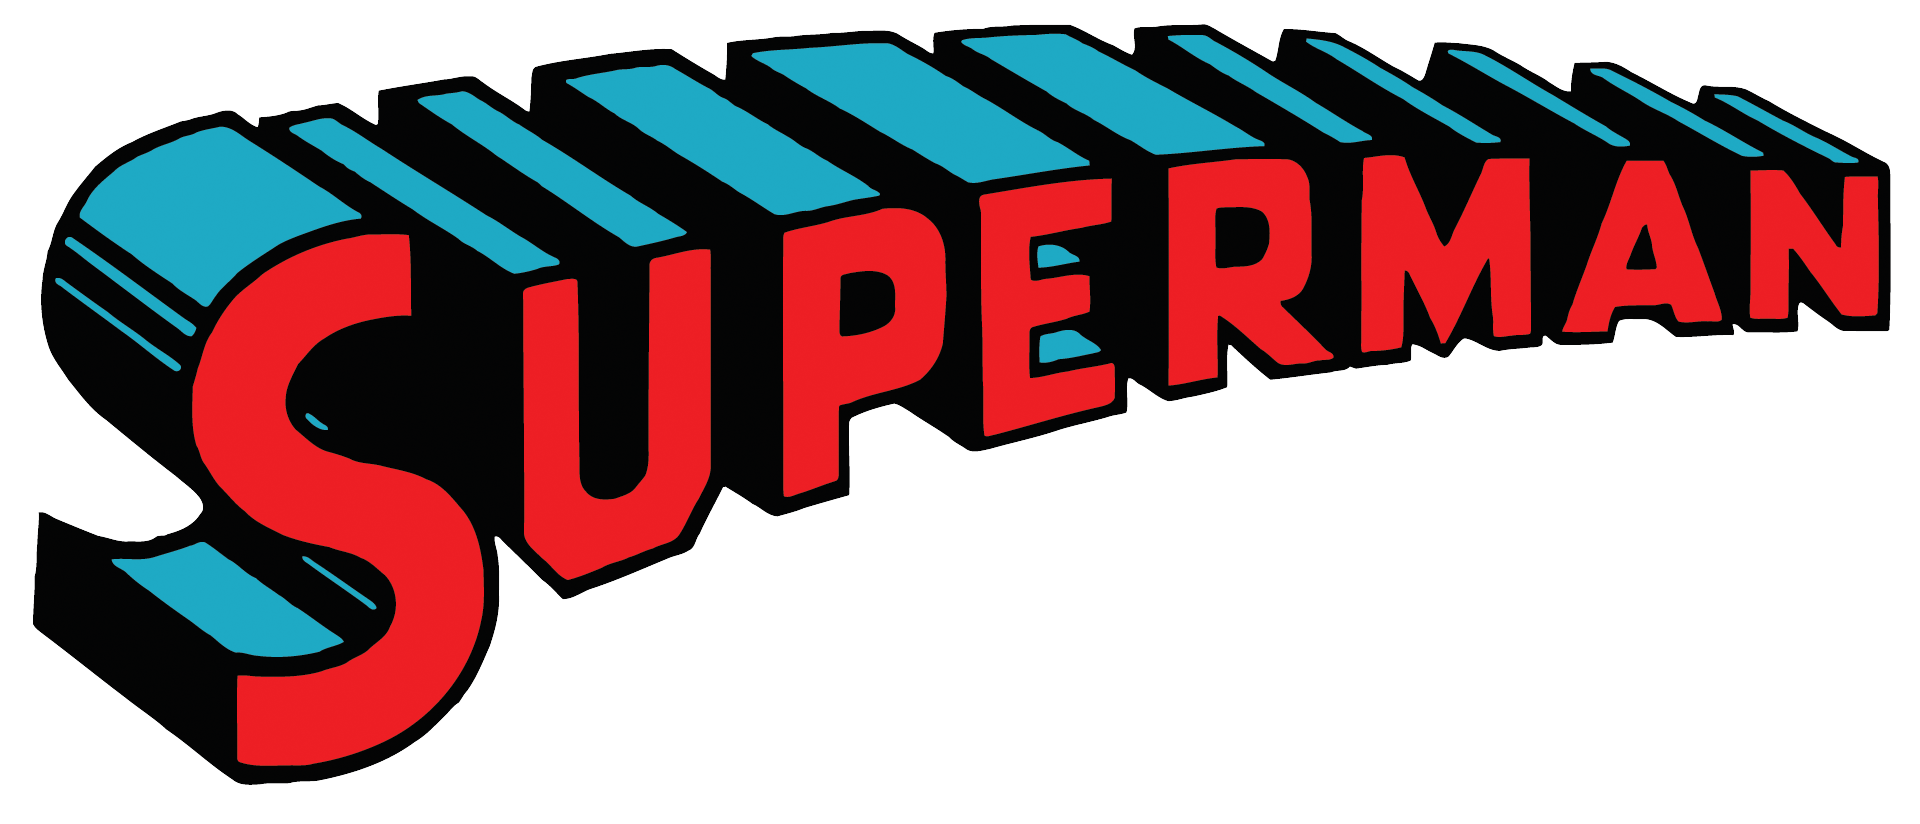 500+ Superman Logo, Wallpapers, HD Images, Vectors Free ...